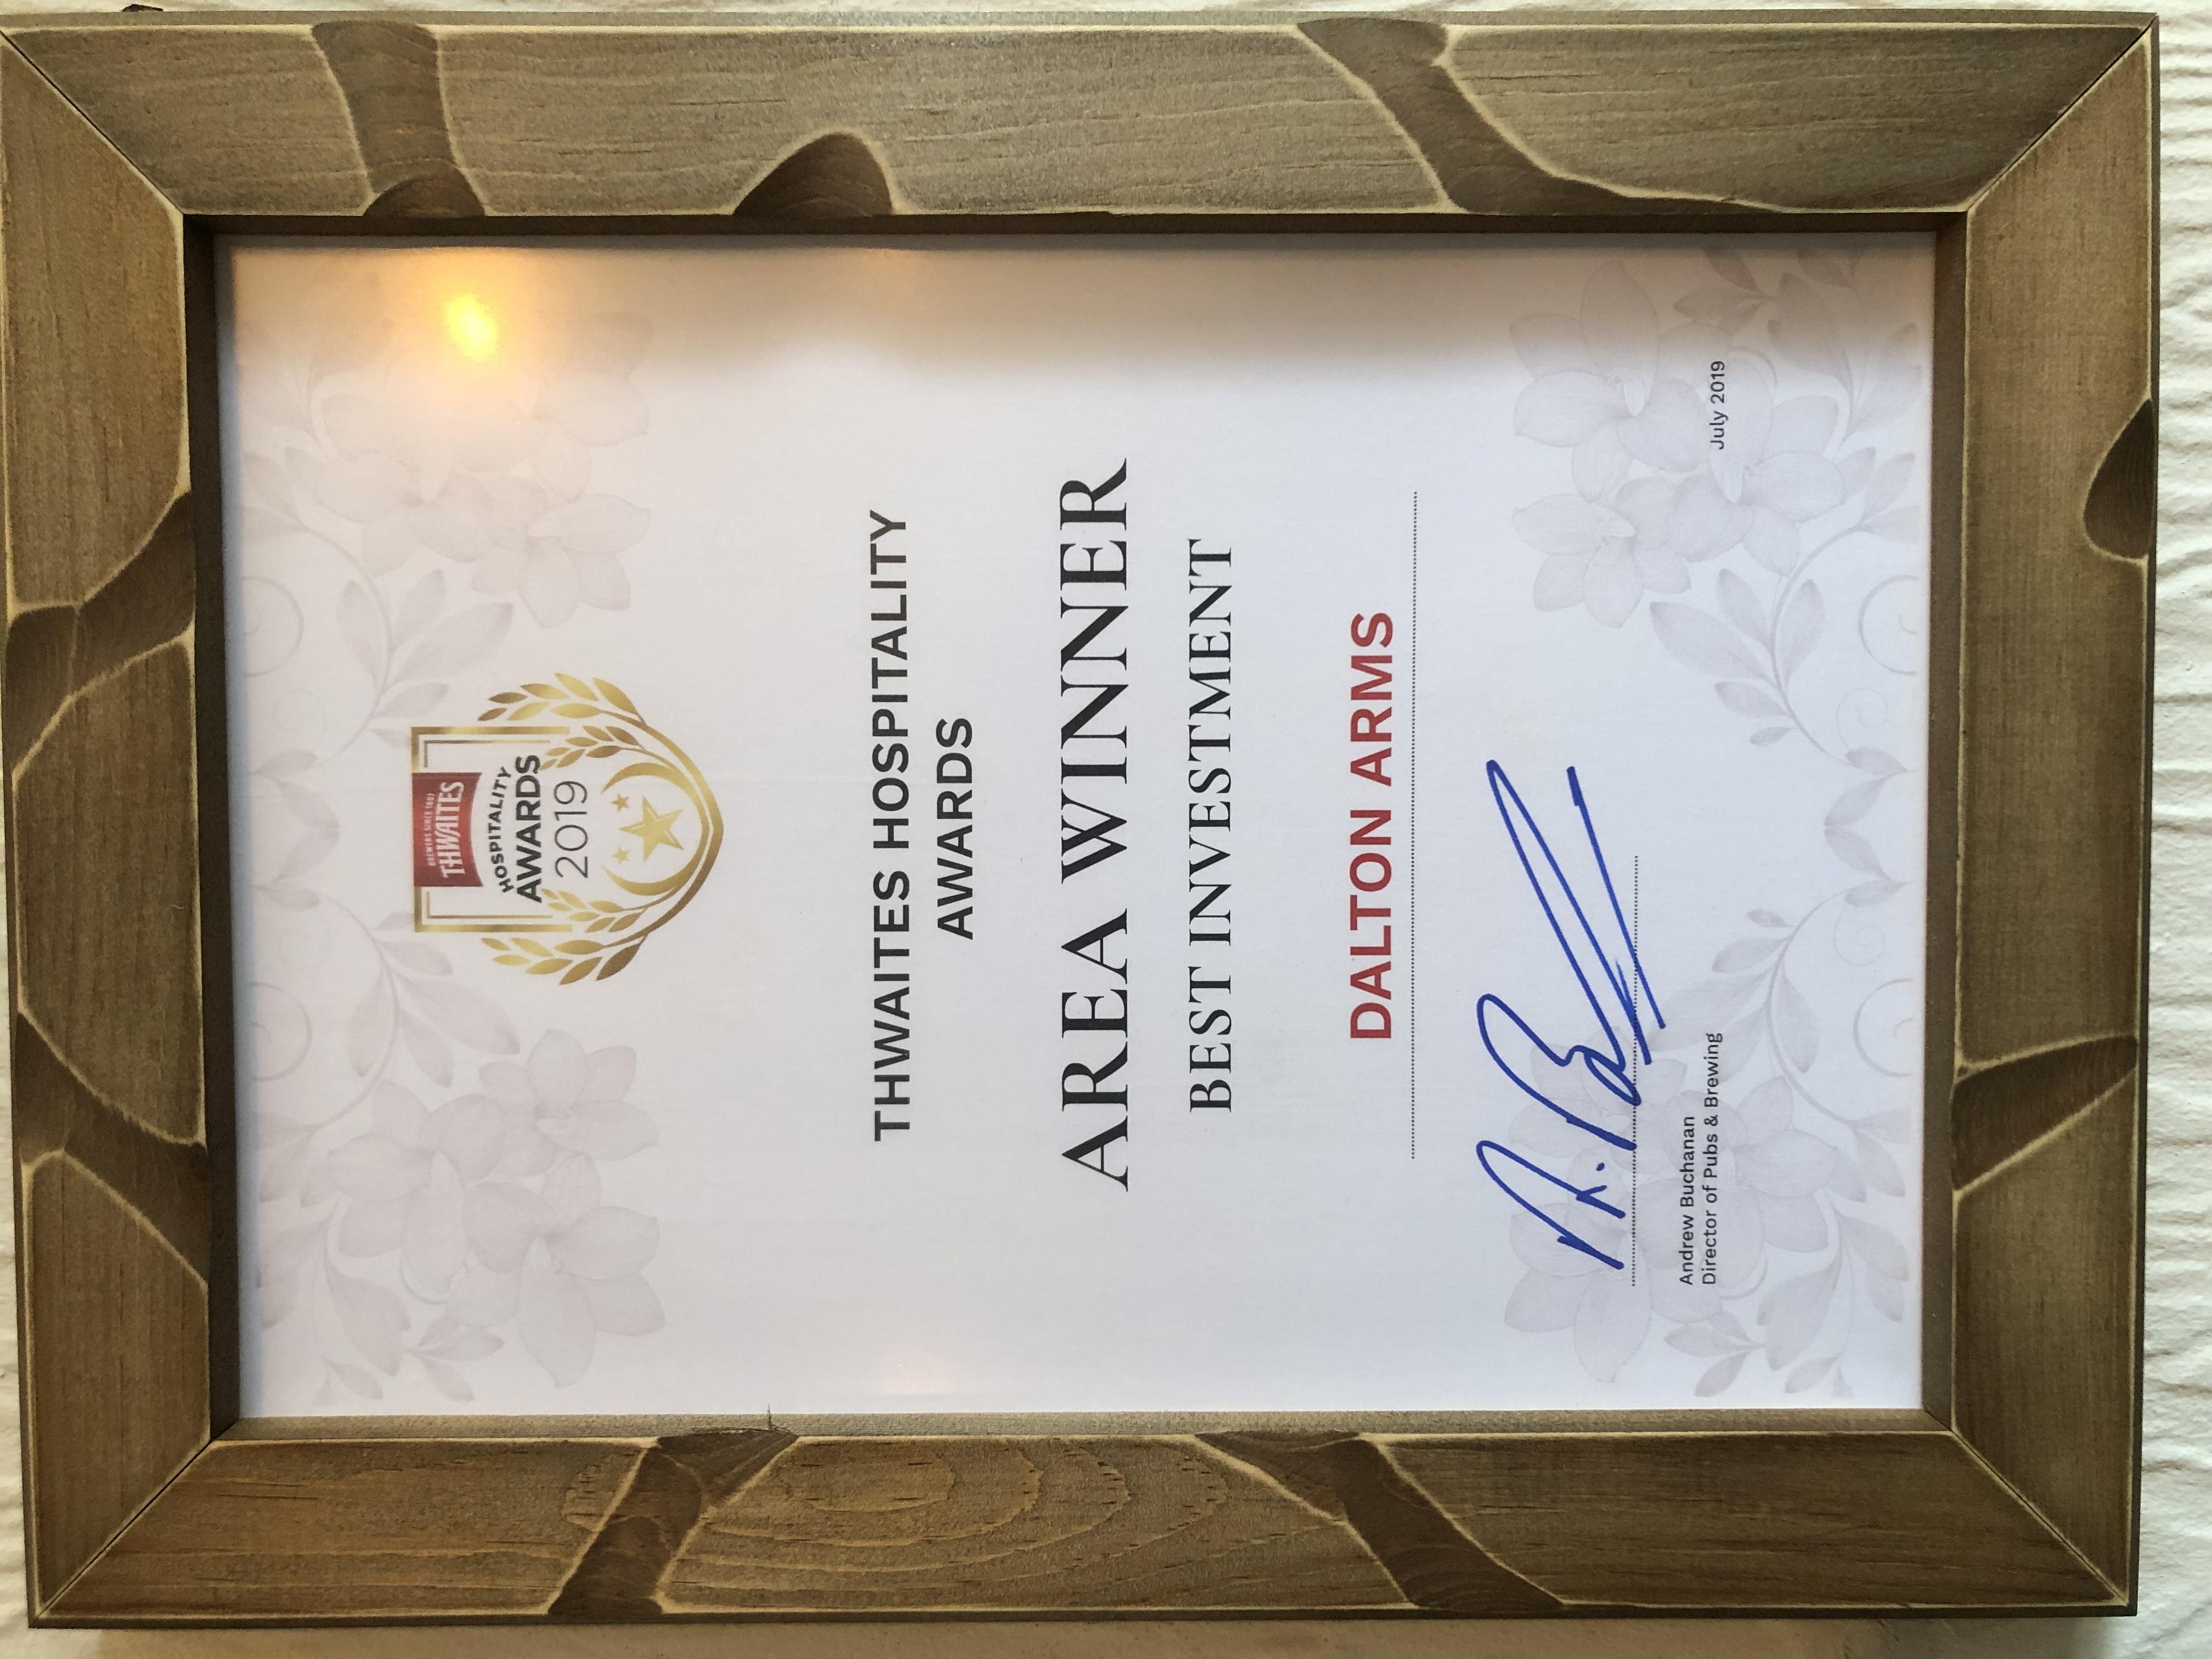 It's Official 'THWAITES HOSPITALITY AWARD AREA WINNER 2019'